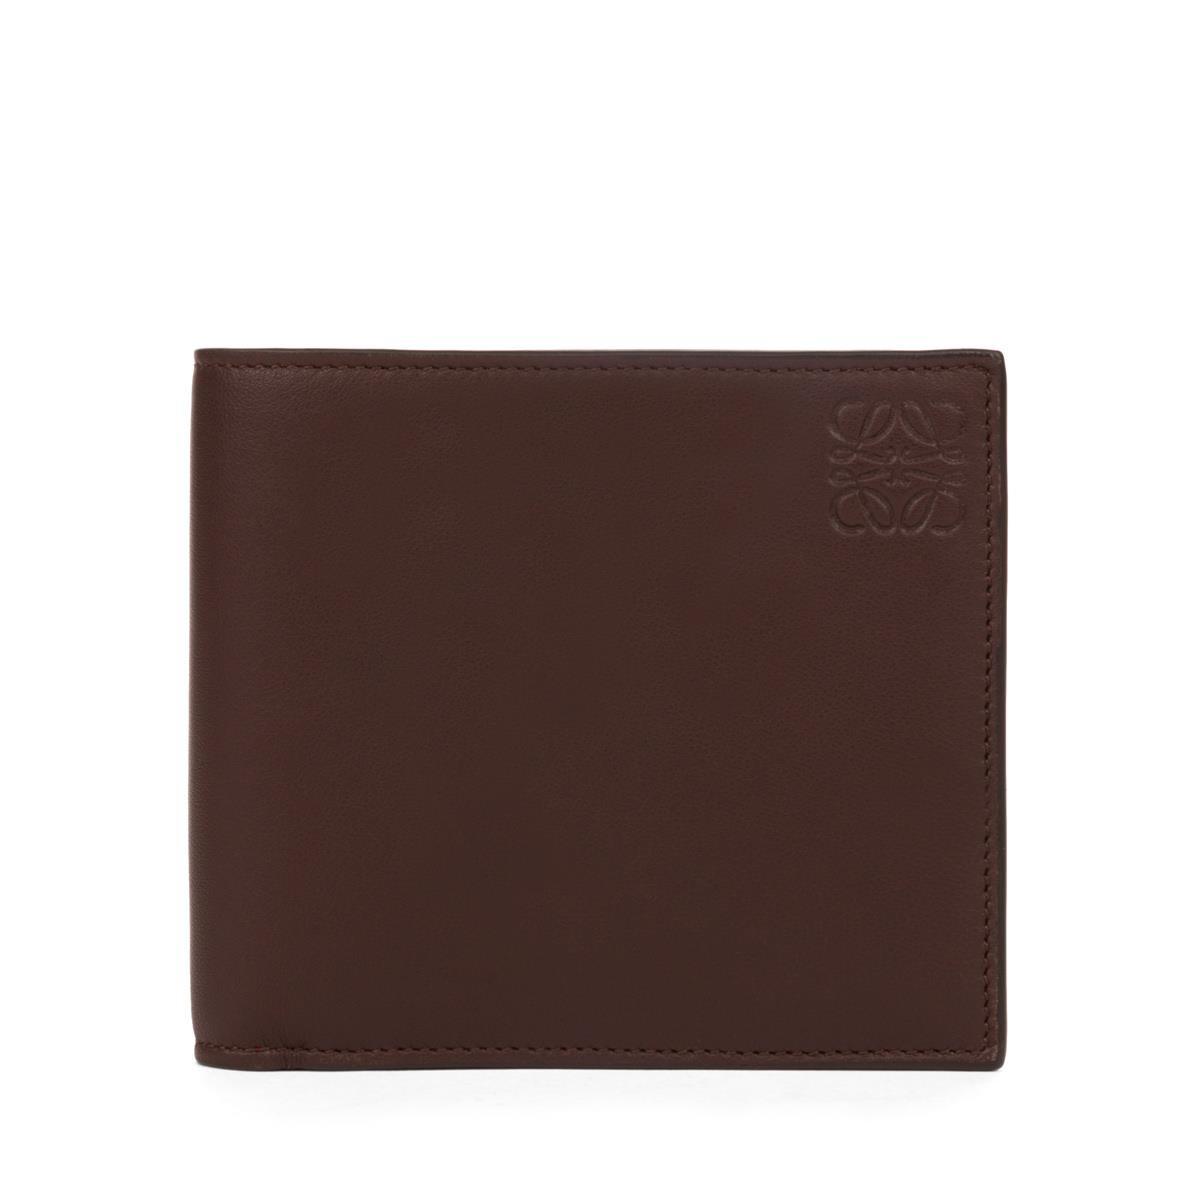 LOEWE Bifold Wallet Chocolate/Burgundy front